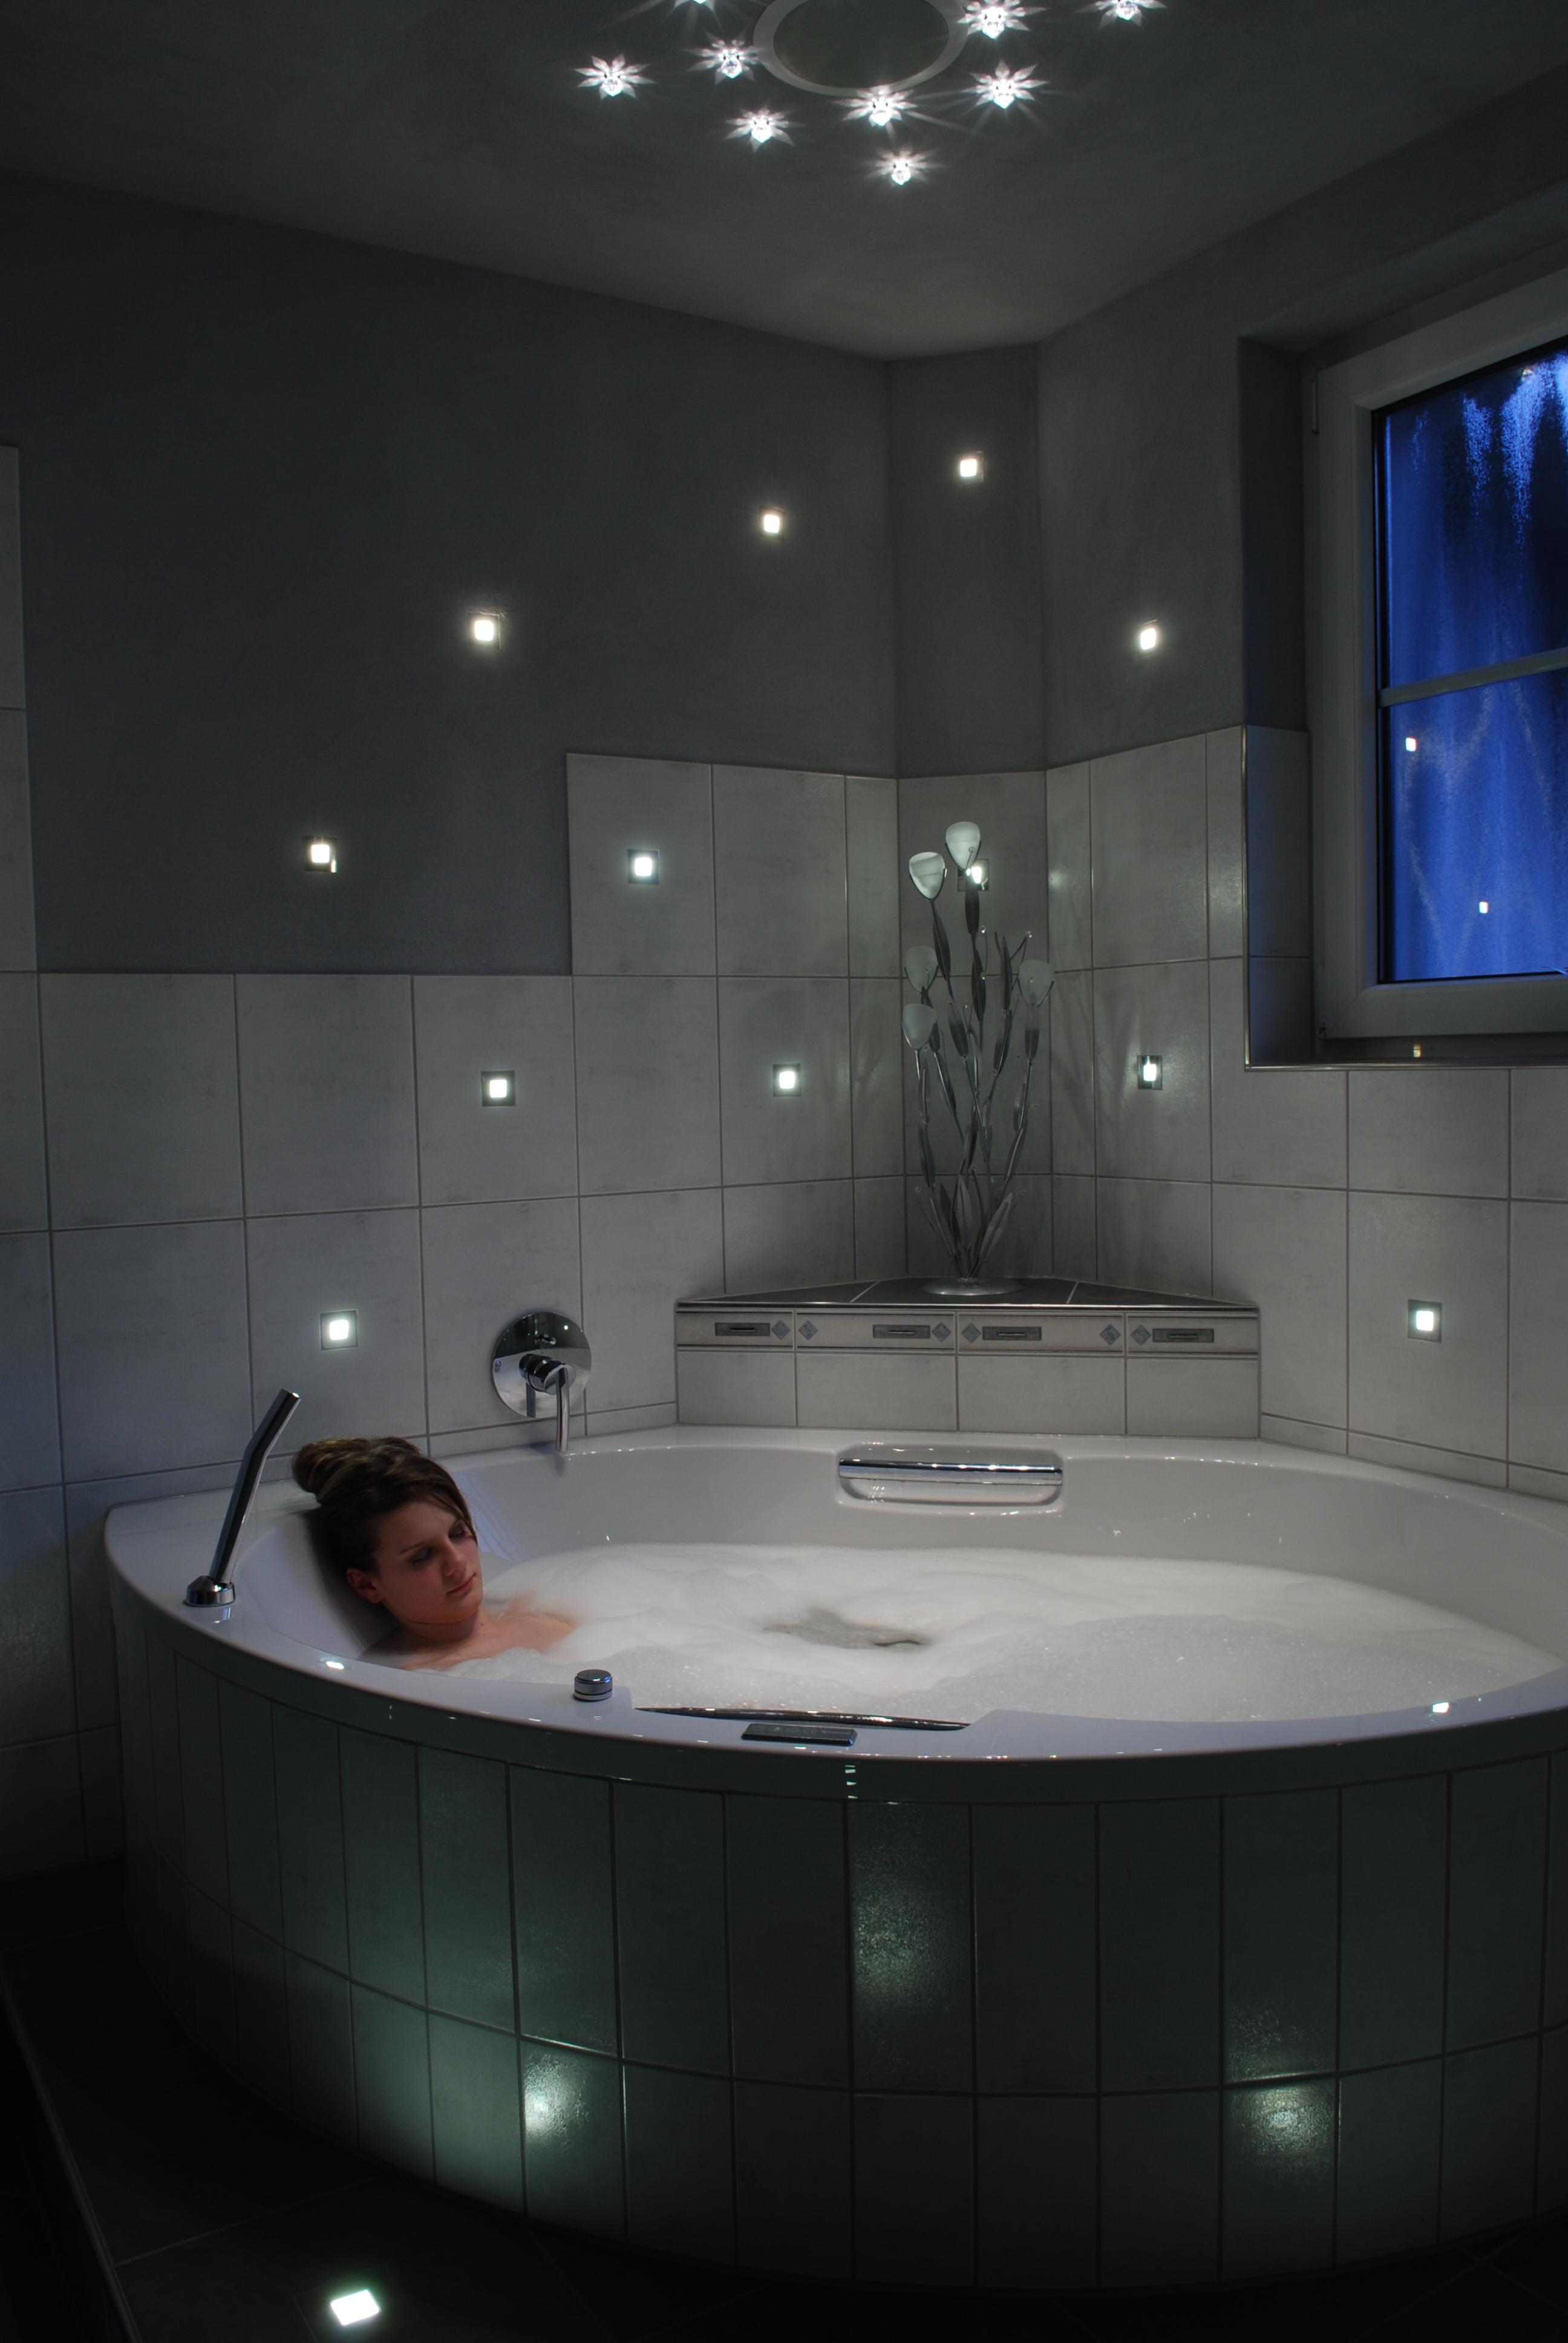 Licht Ideen Badezimmer - Badezimmer 2016